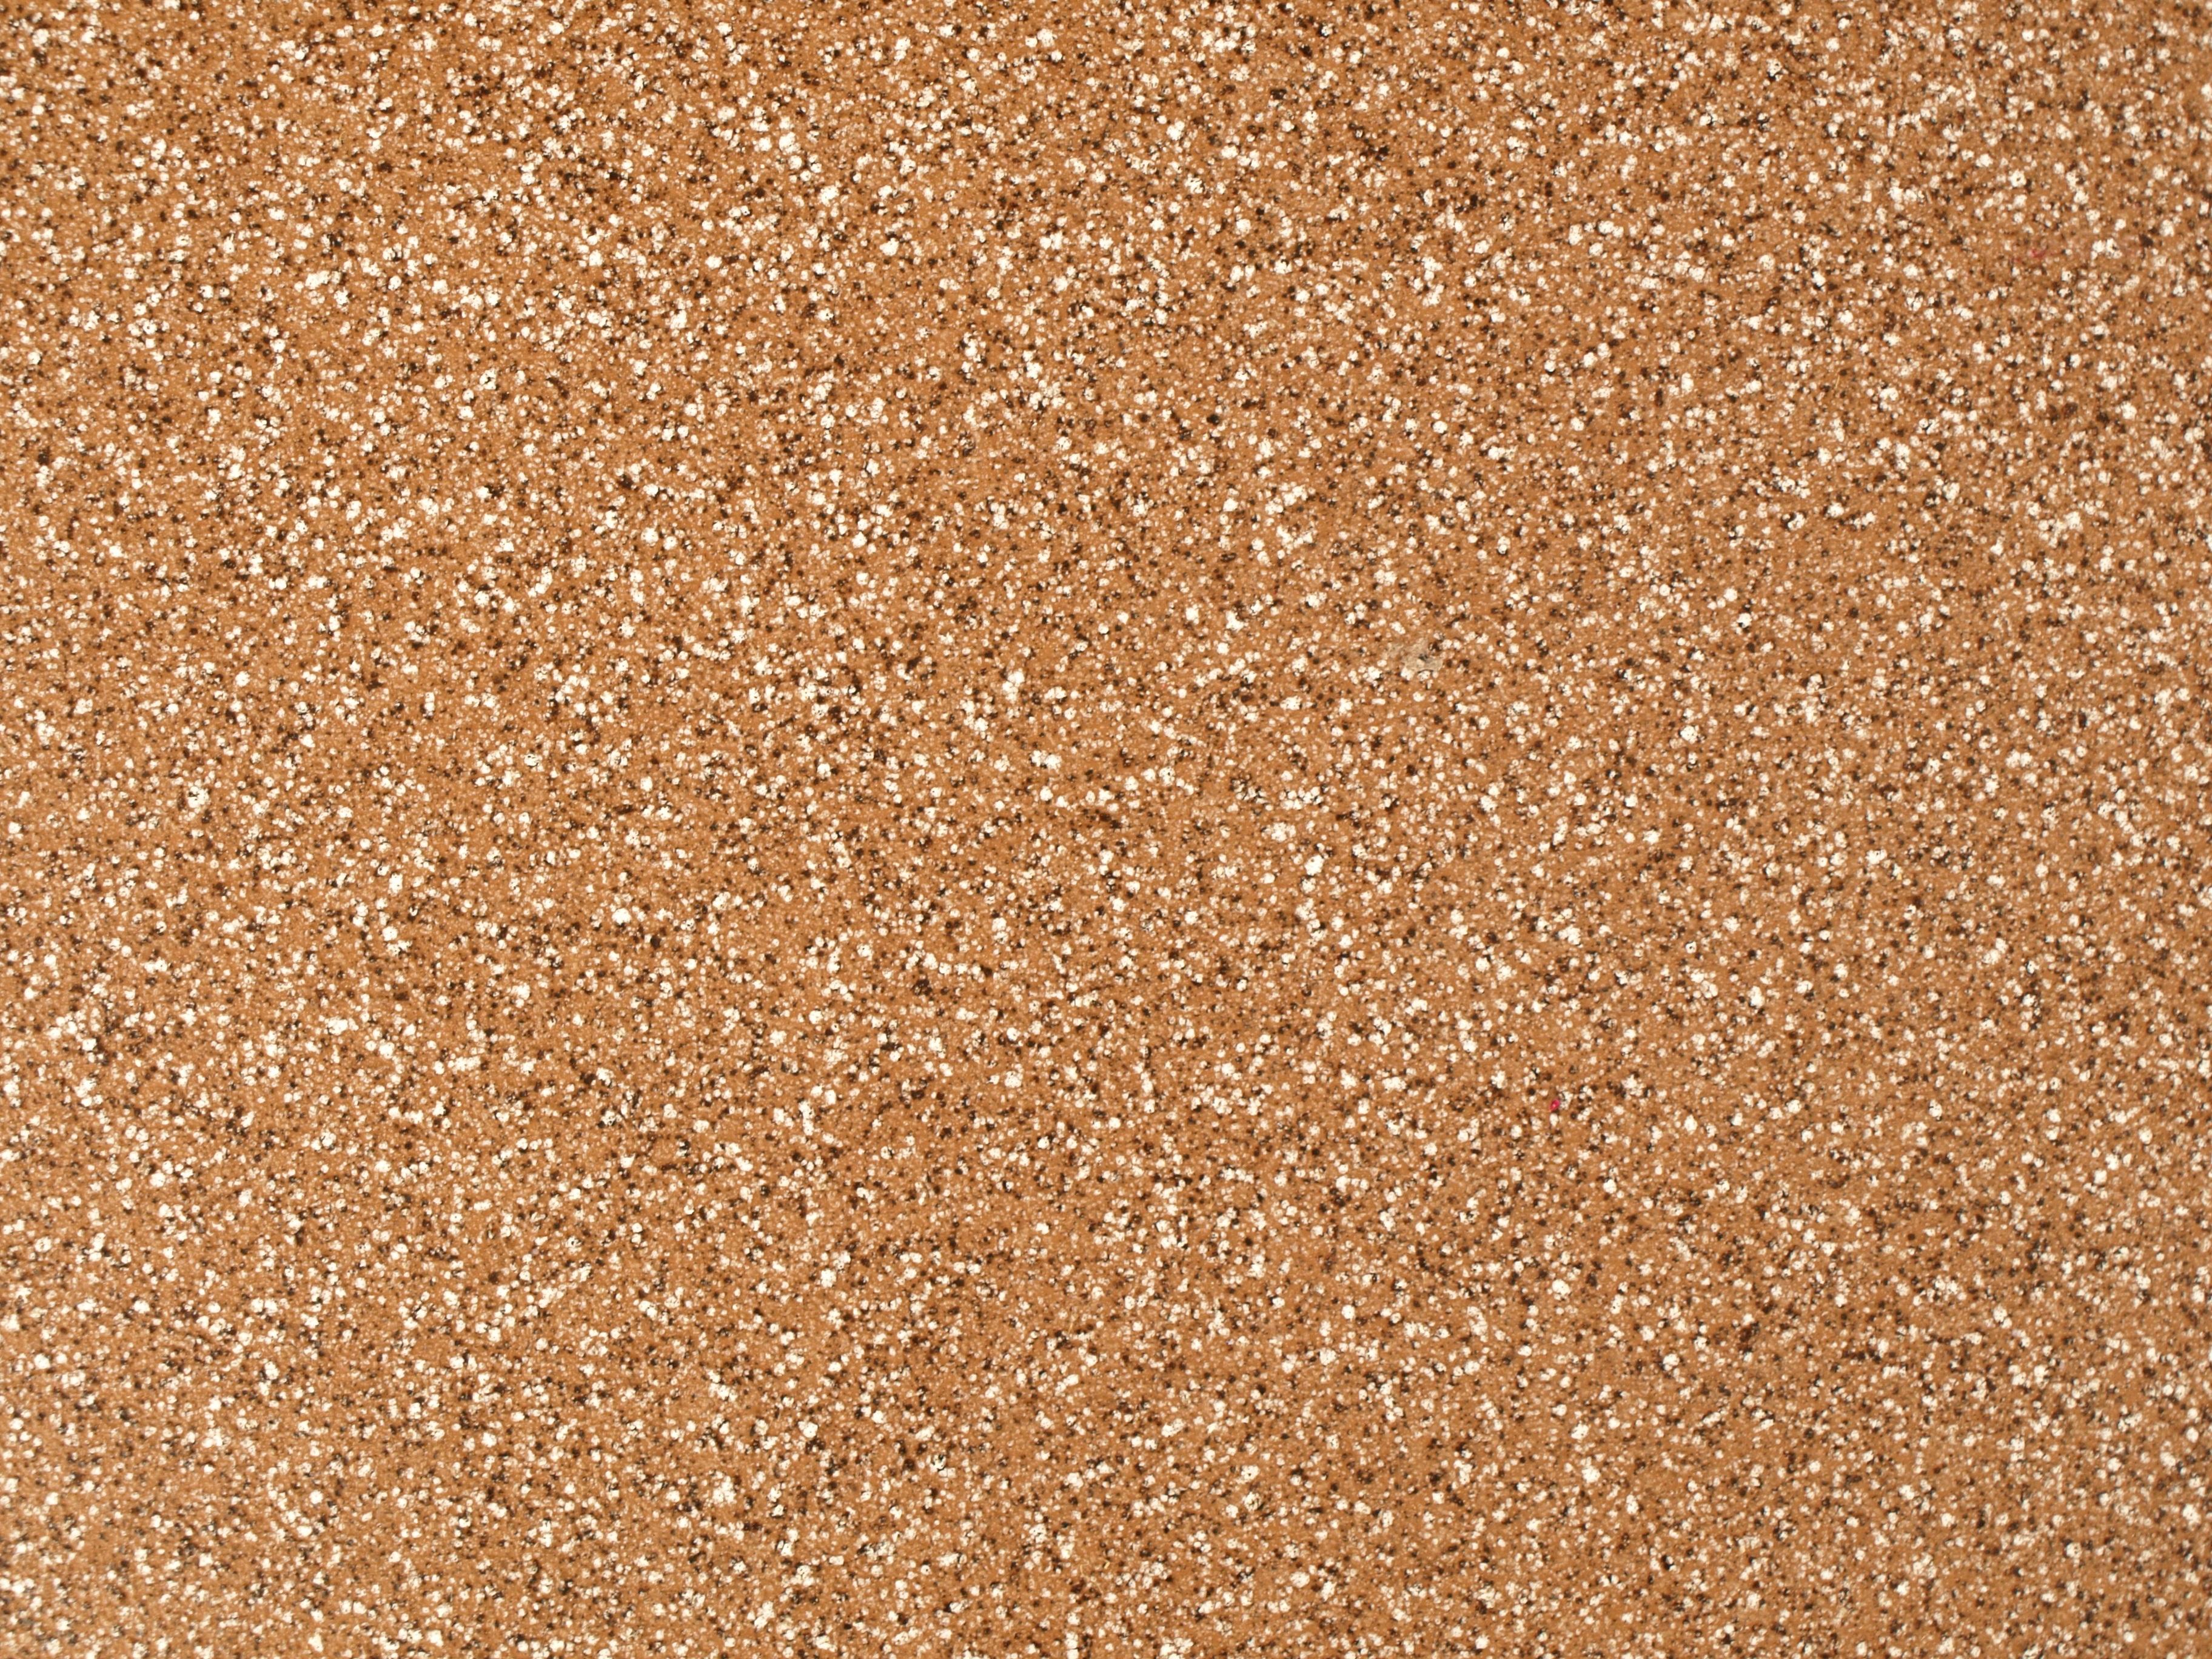 Free stock photos of sand background · Pexels